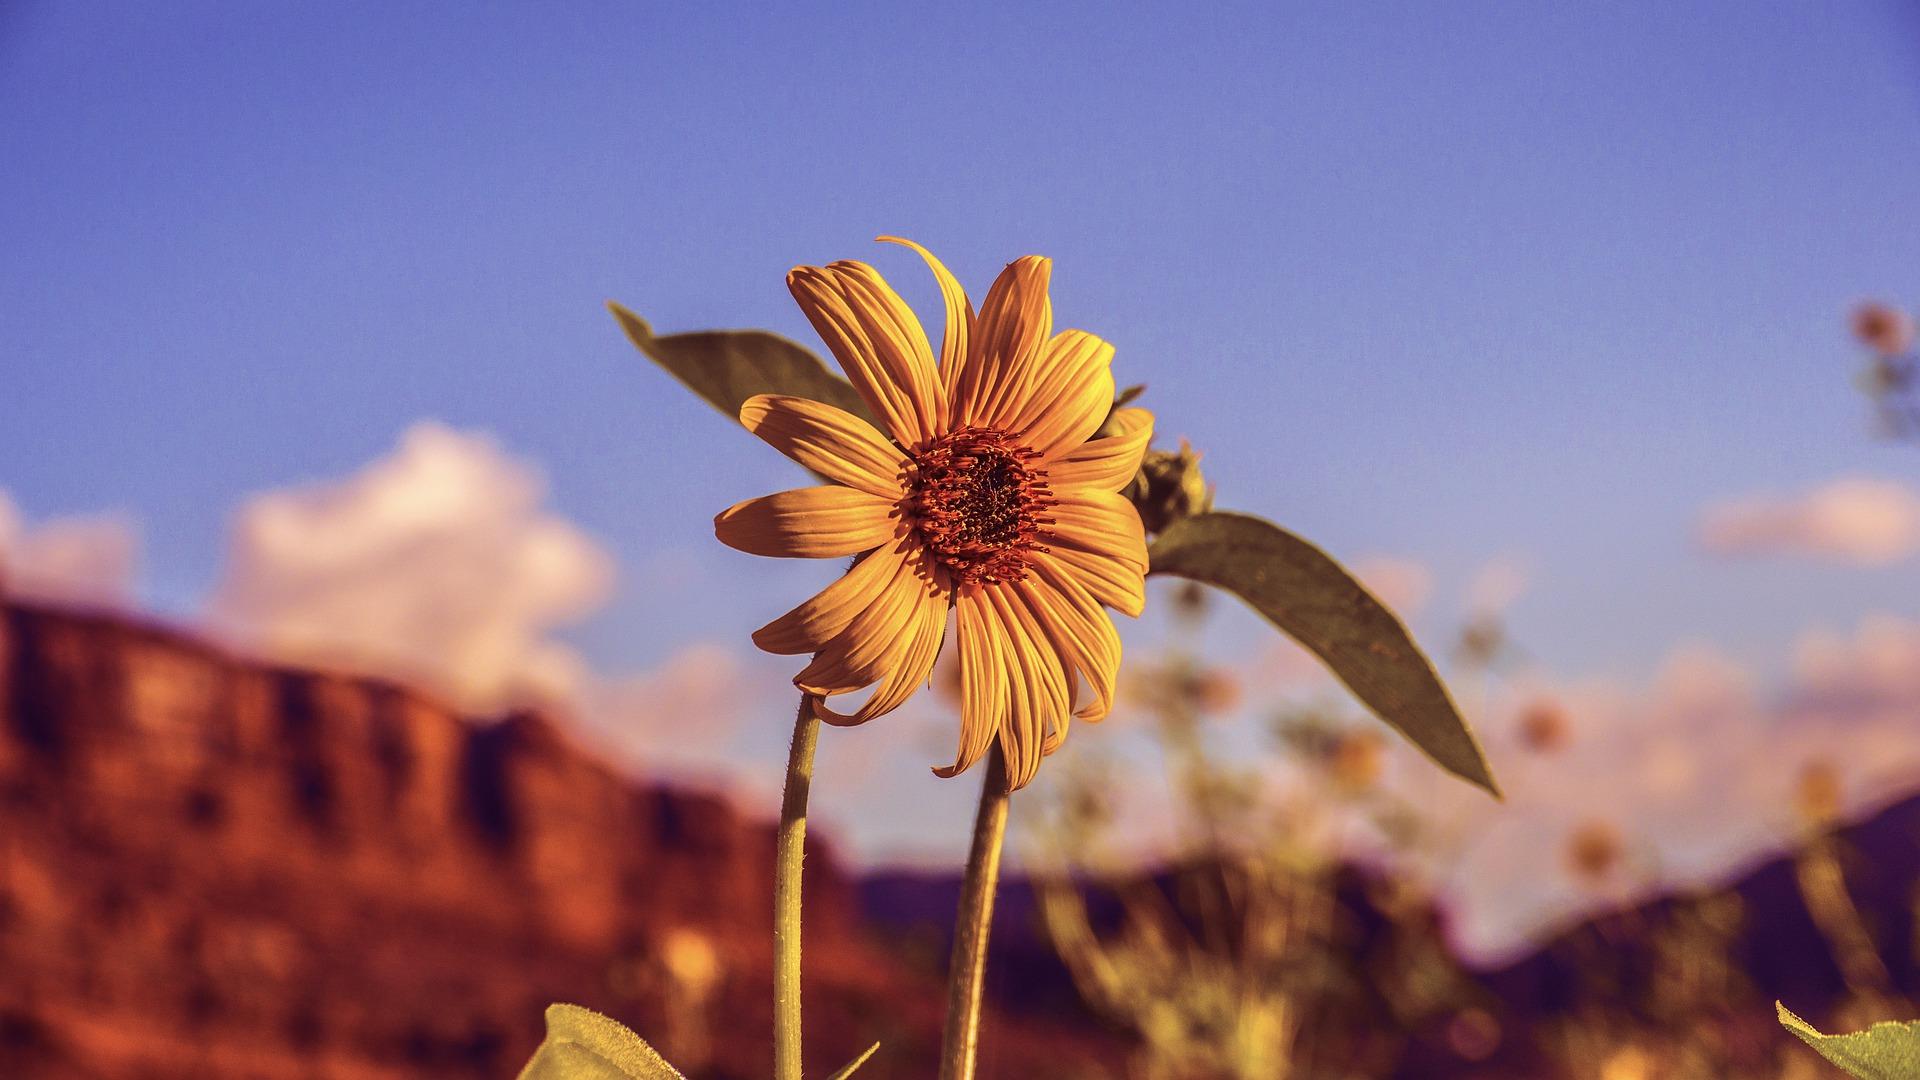 sunflower-4320790_1920